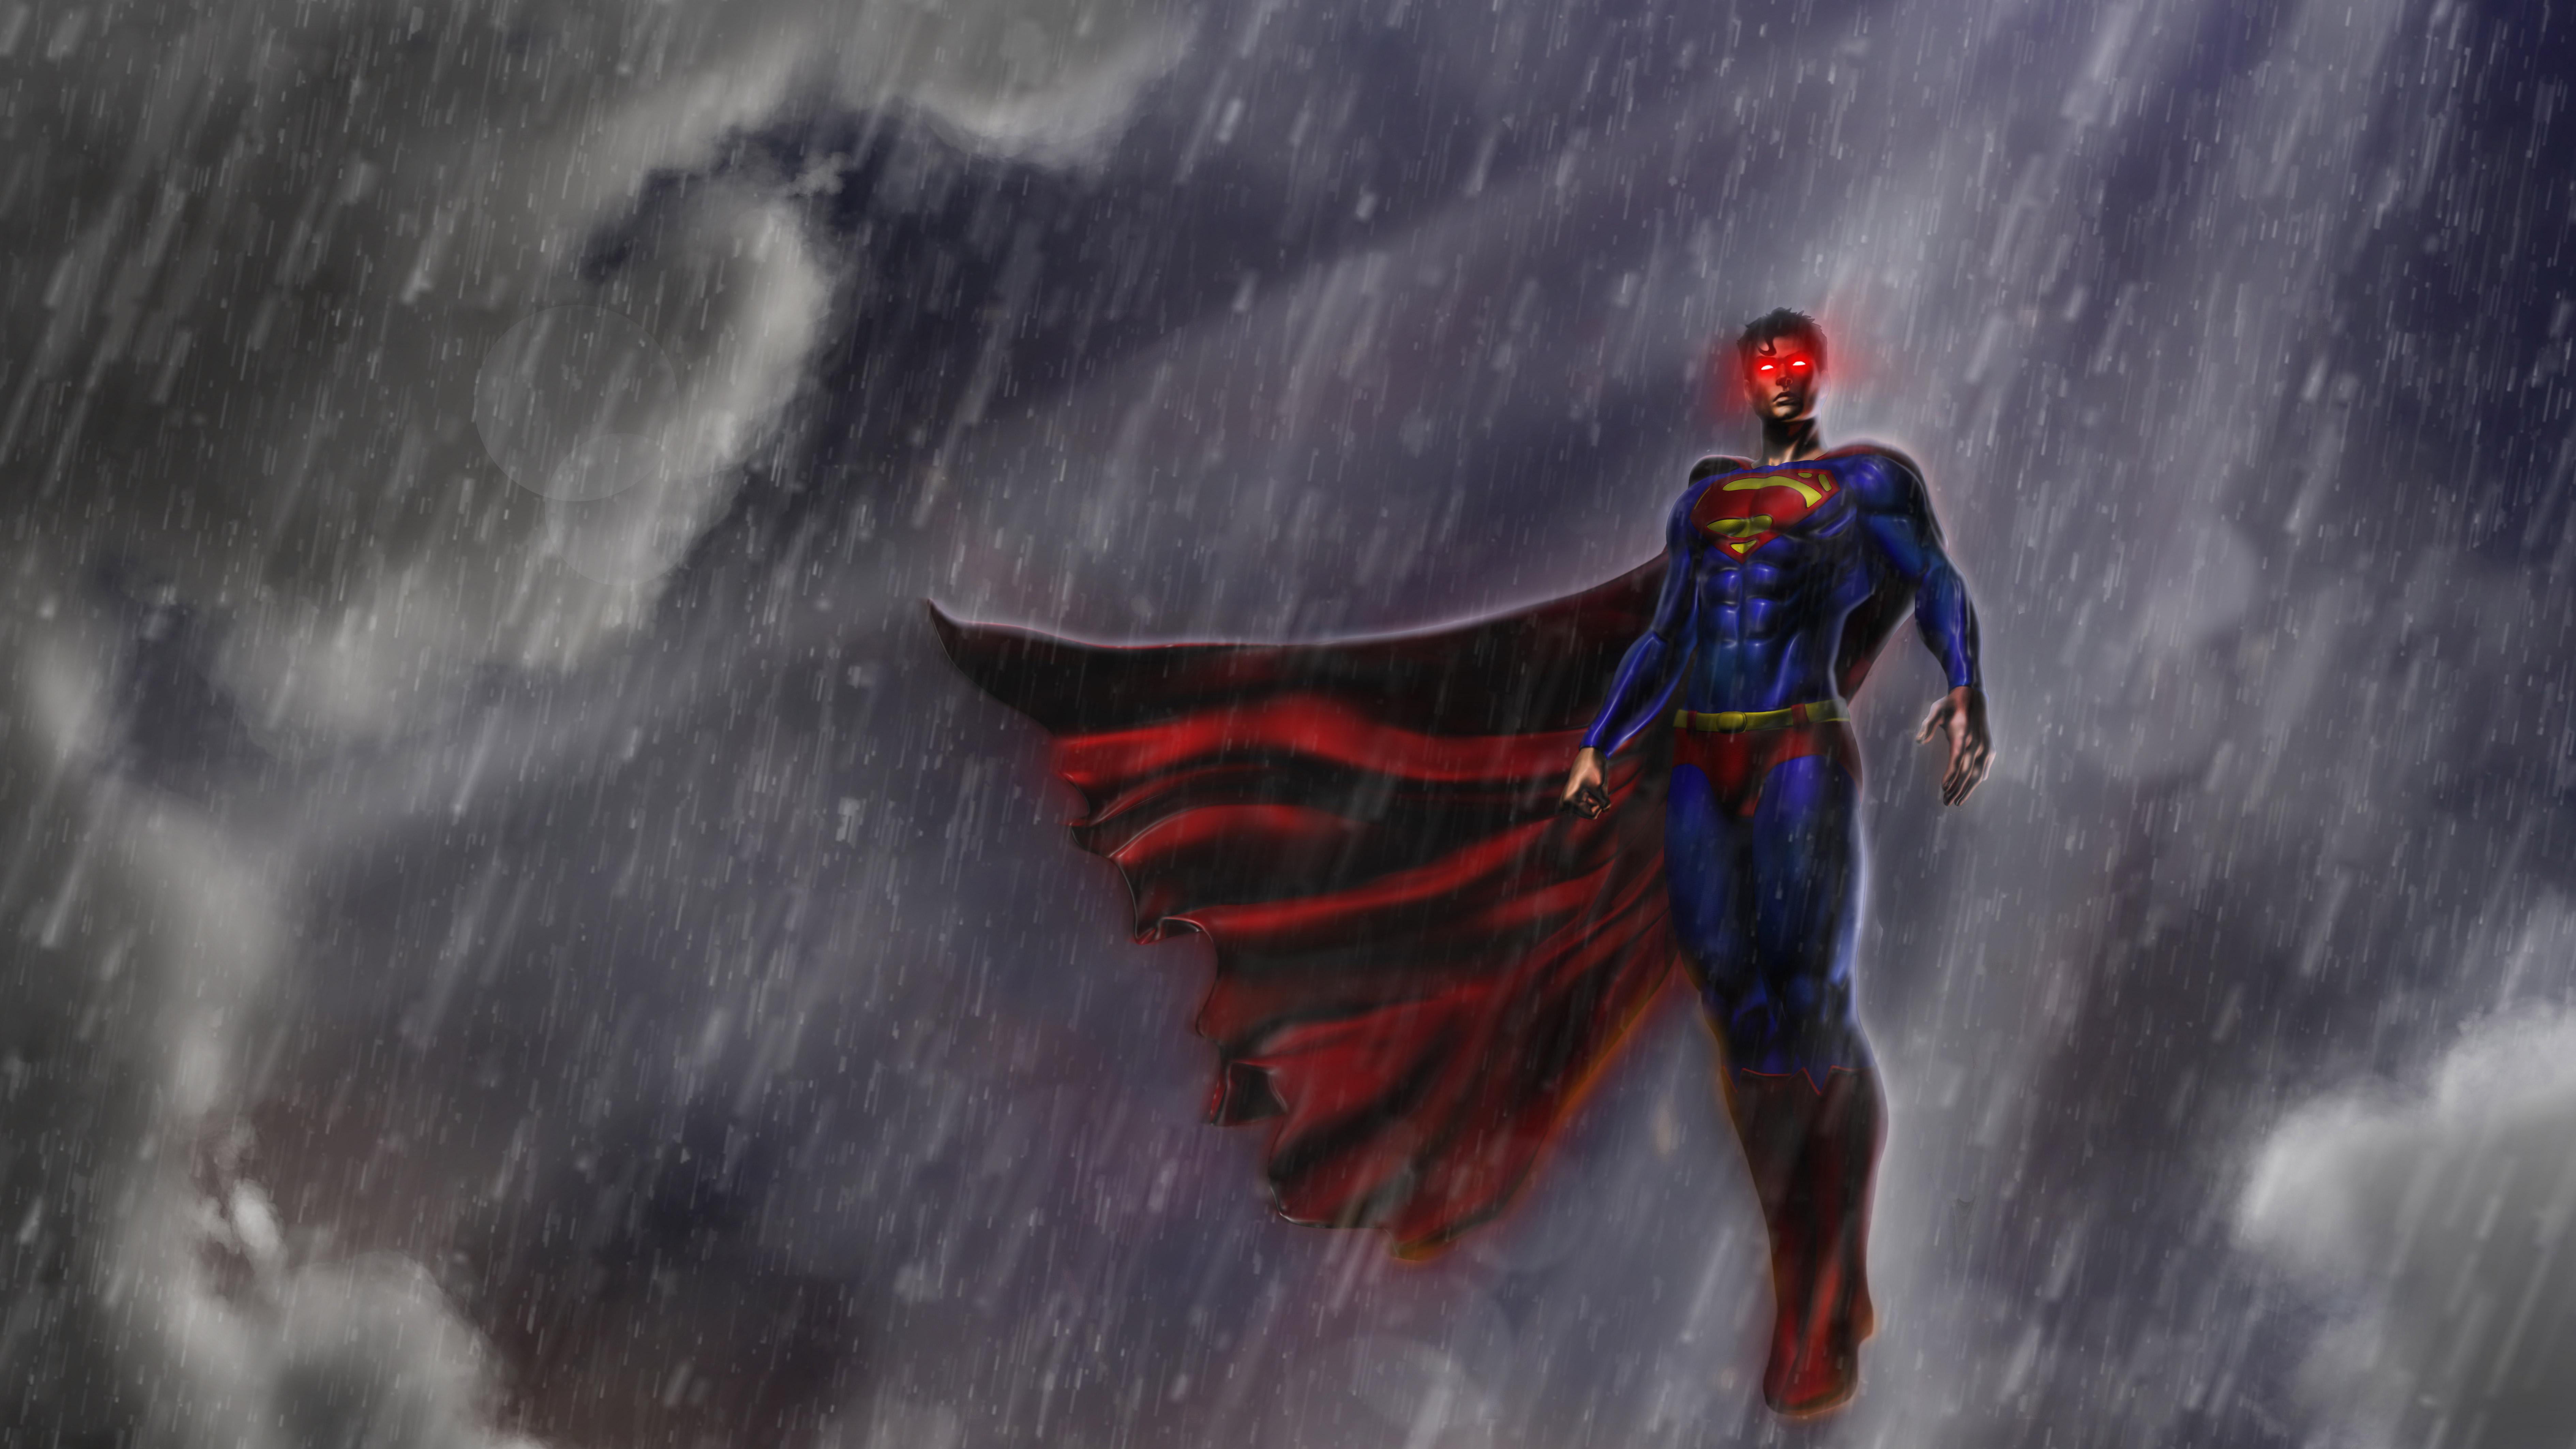 Superman justice league artwork 8k hd superheroes 4k - 8k desktop backgrounds ...